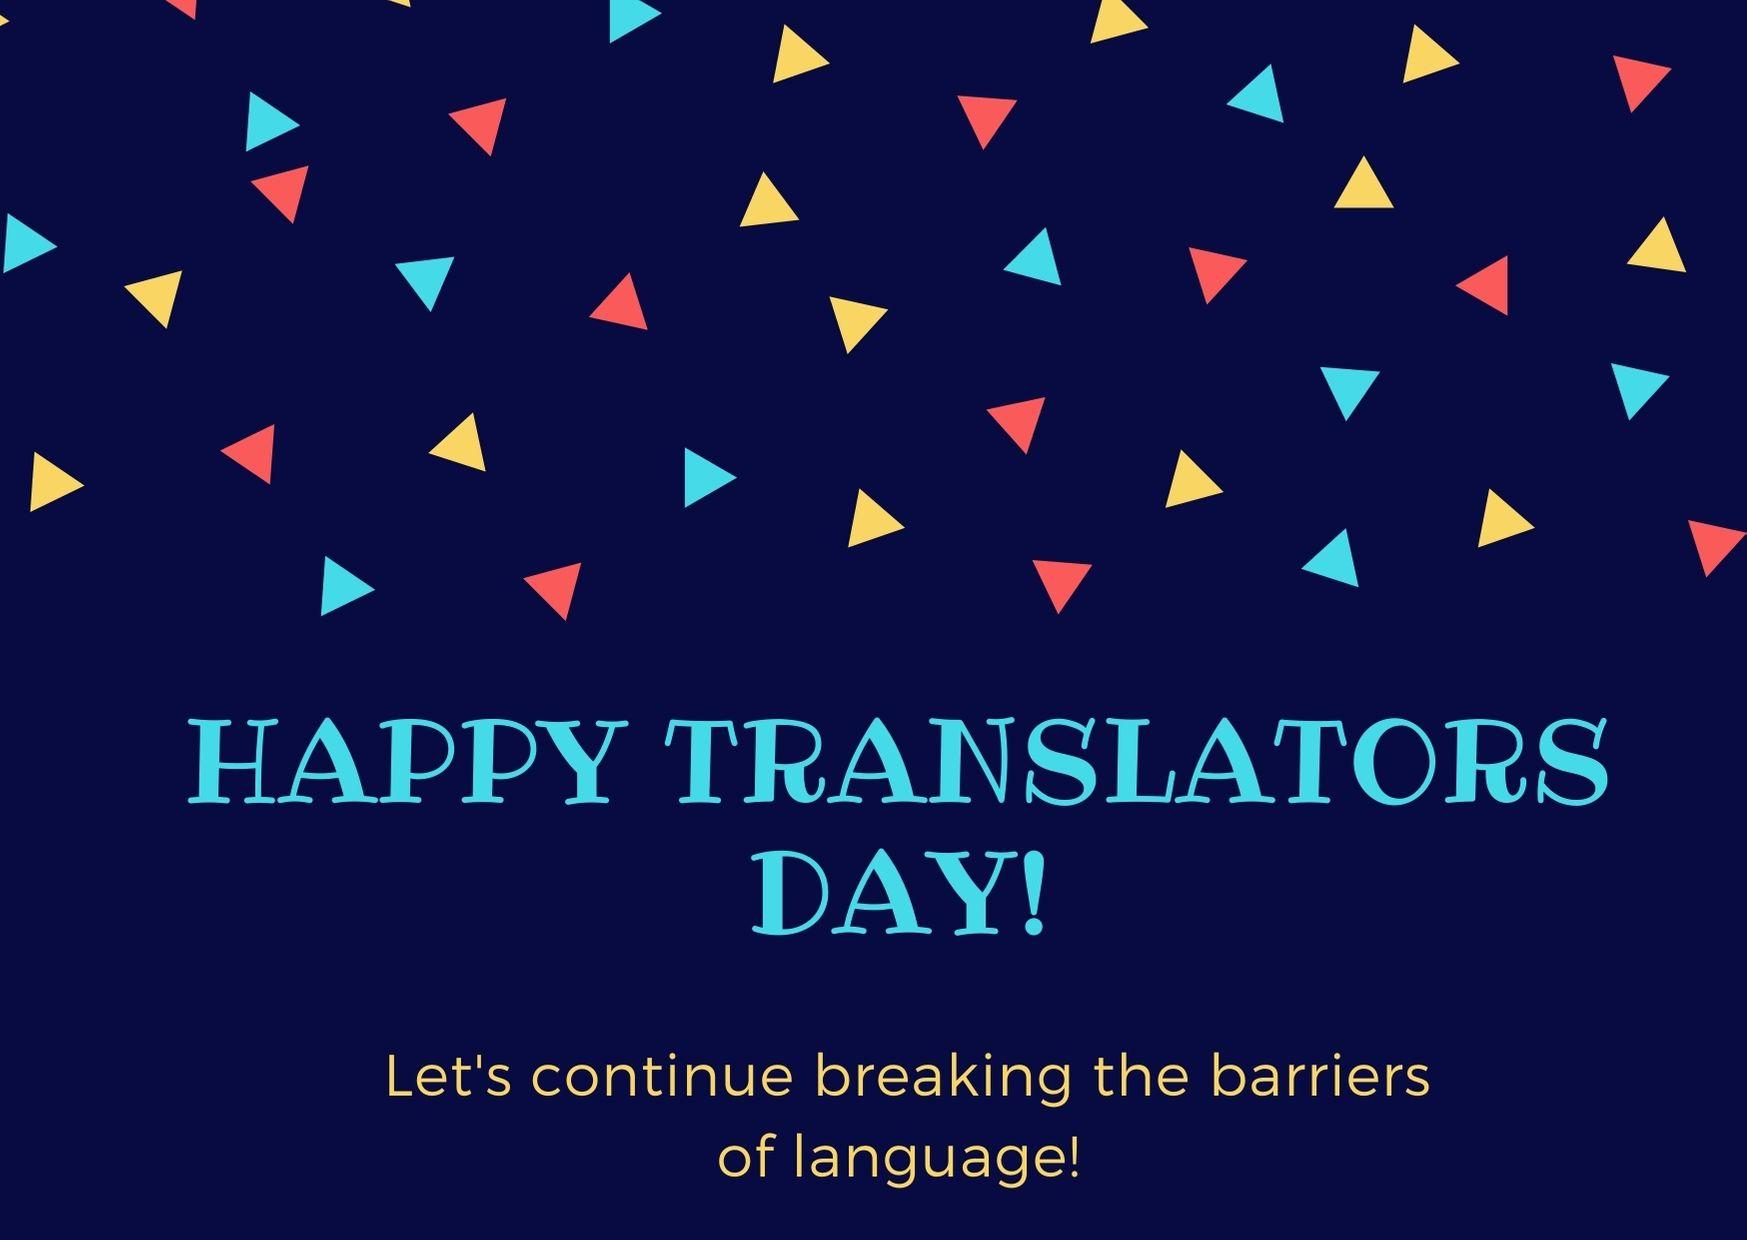 International Day of Translation